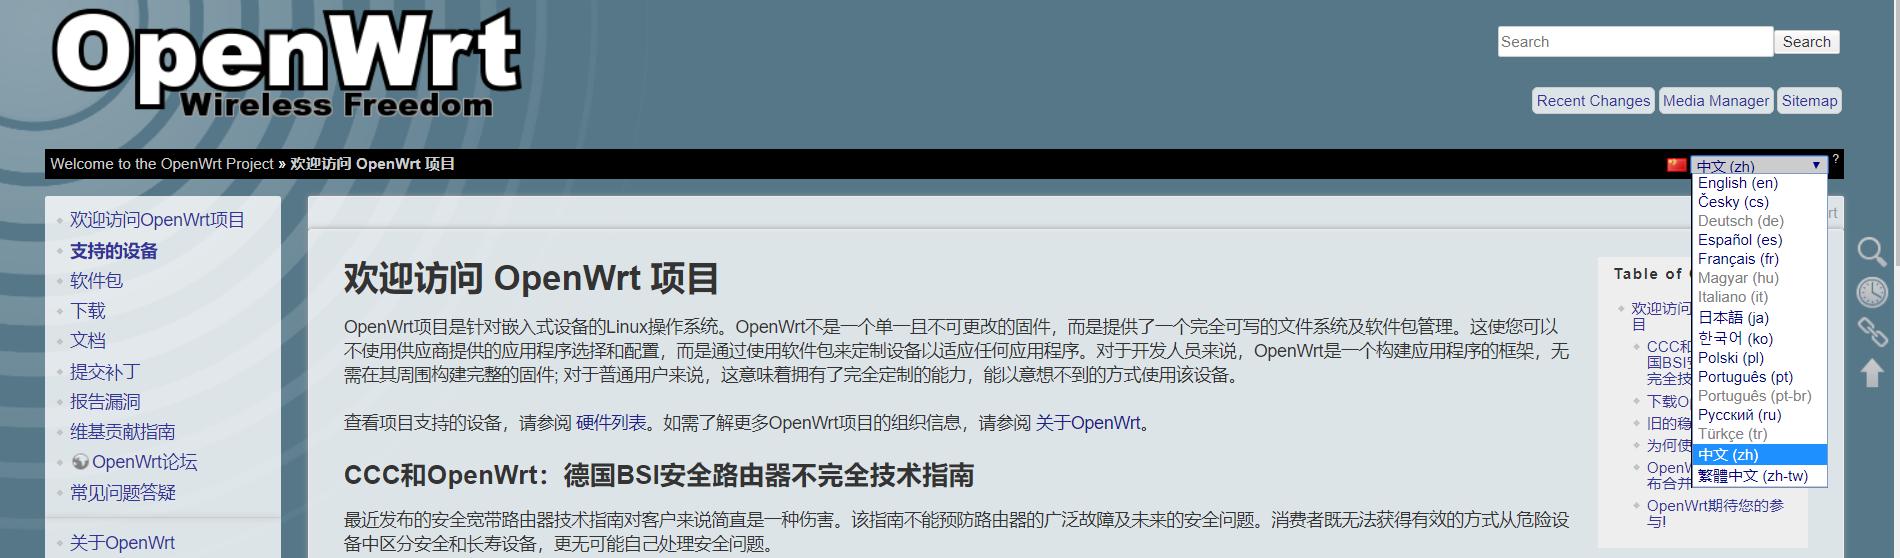 Openwrt V2ray